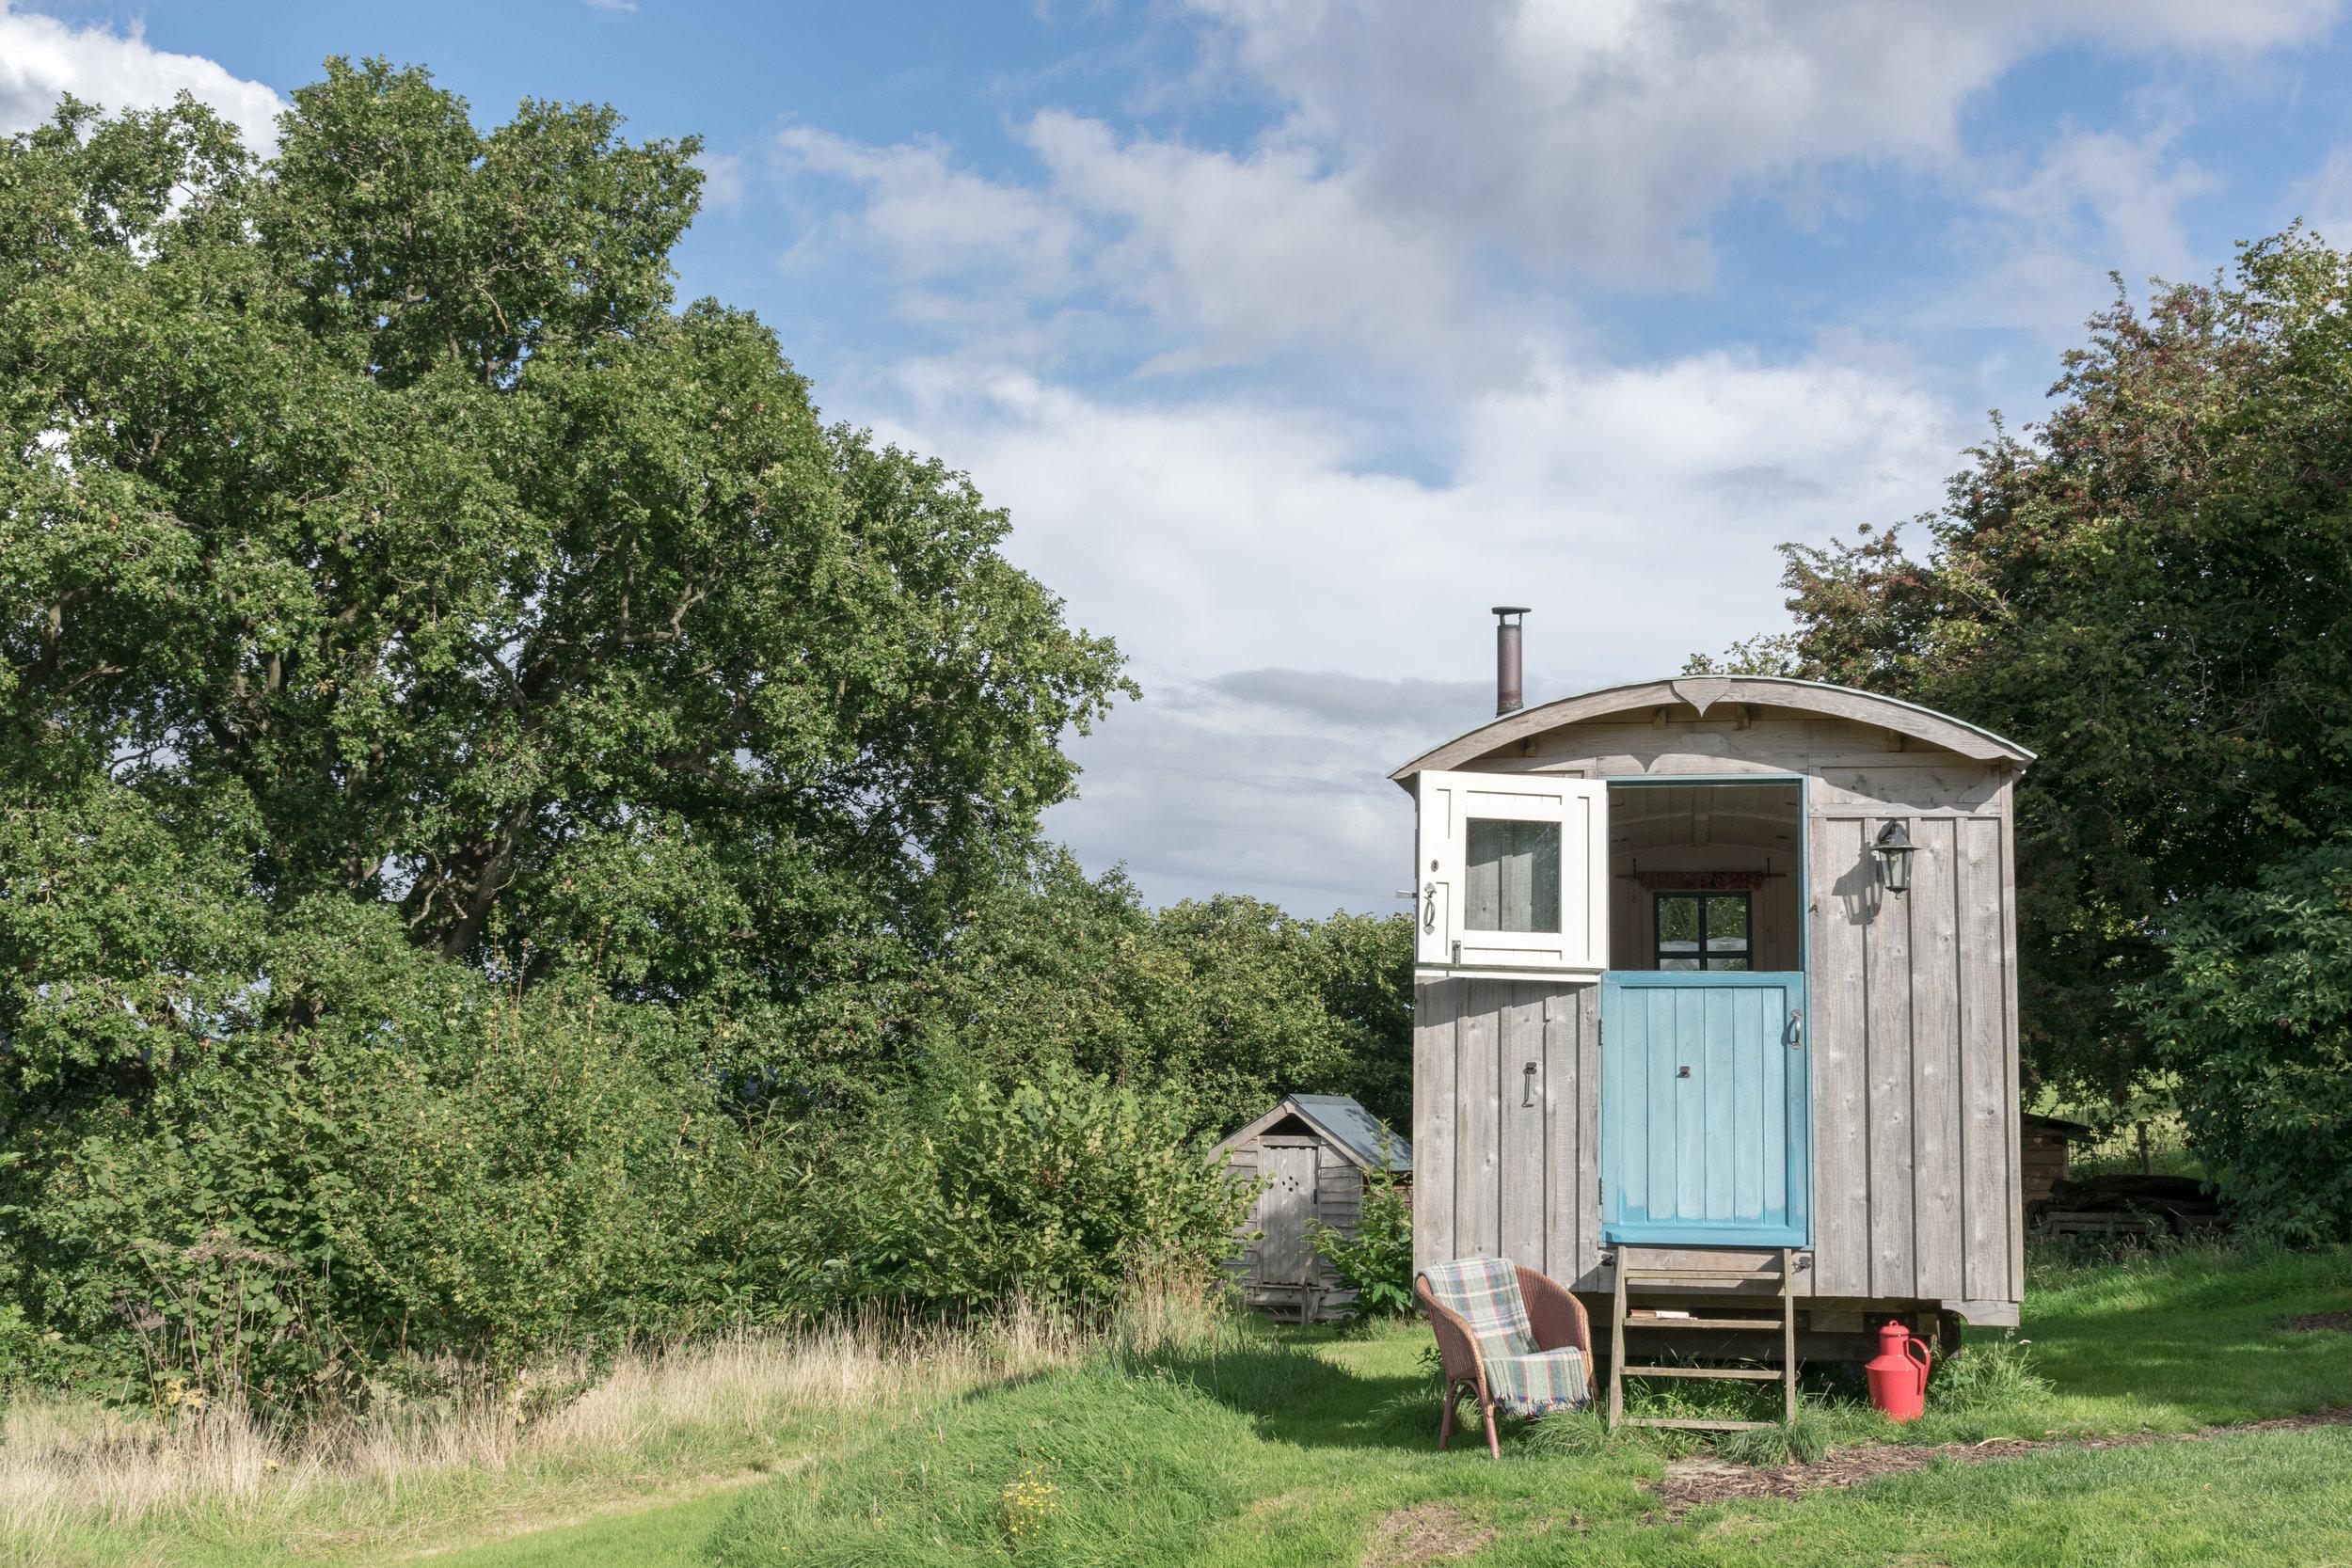 Shepherd's hut, glamping, Wales, Powys